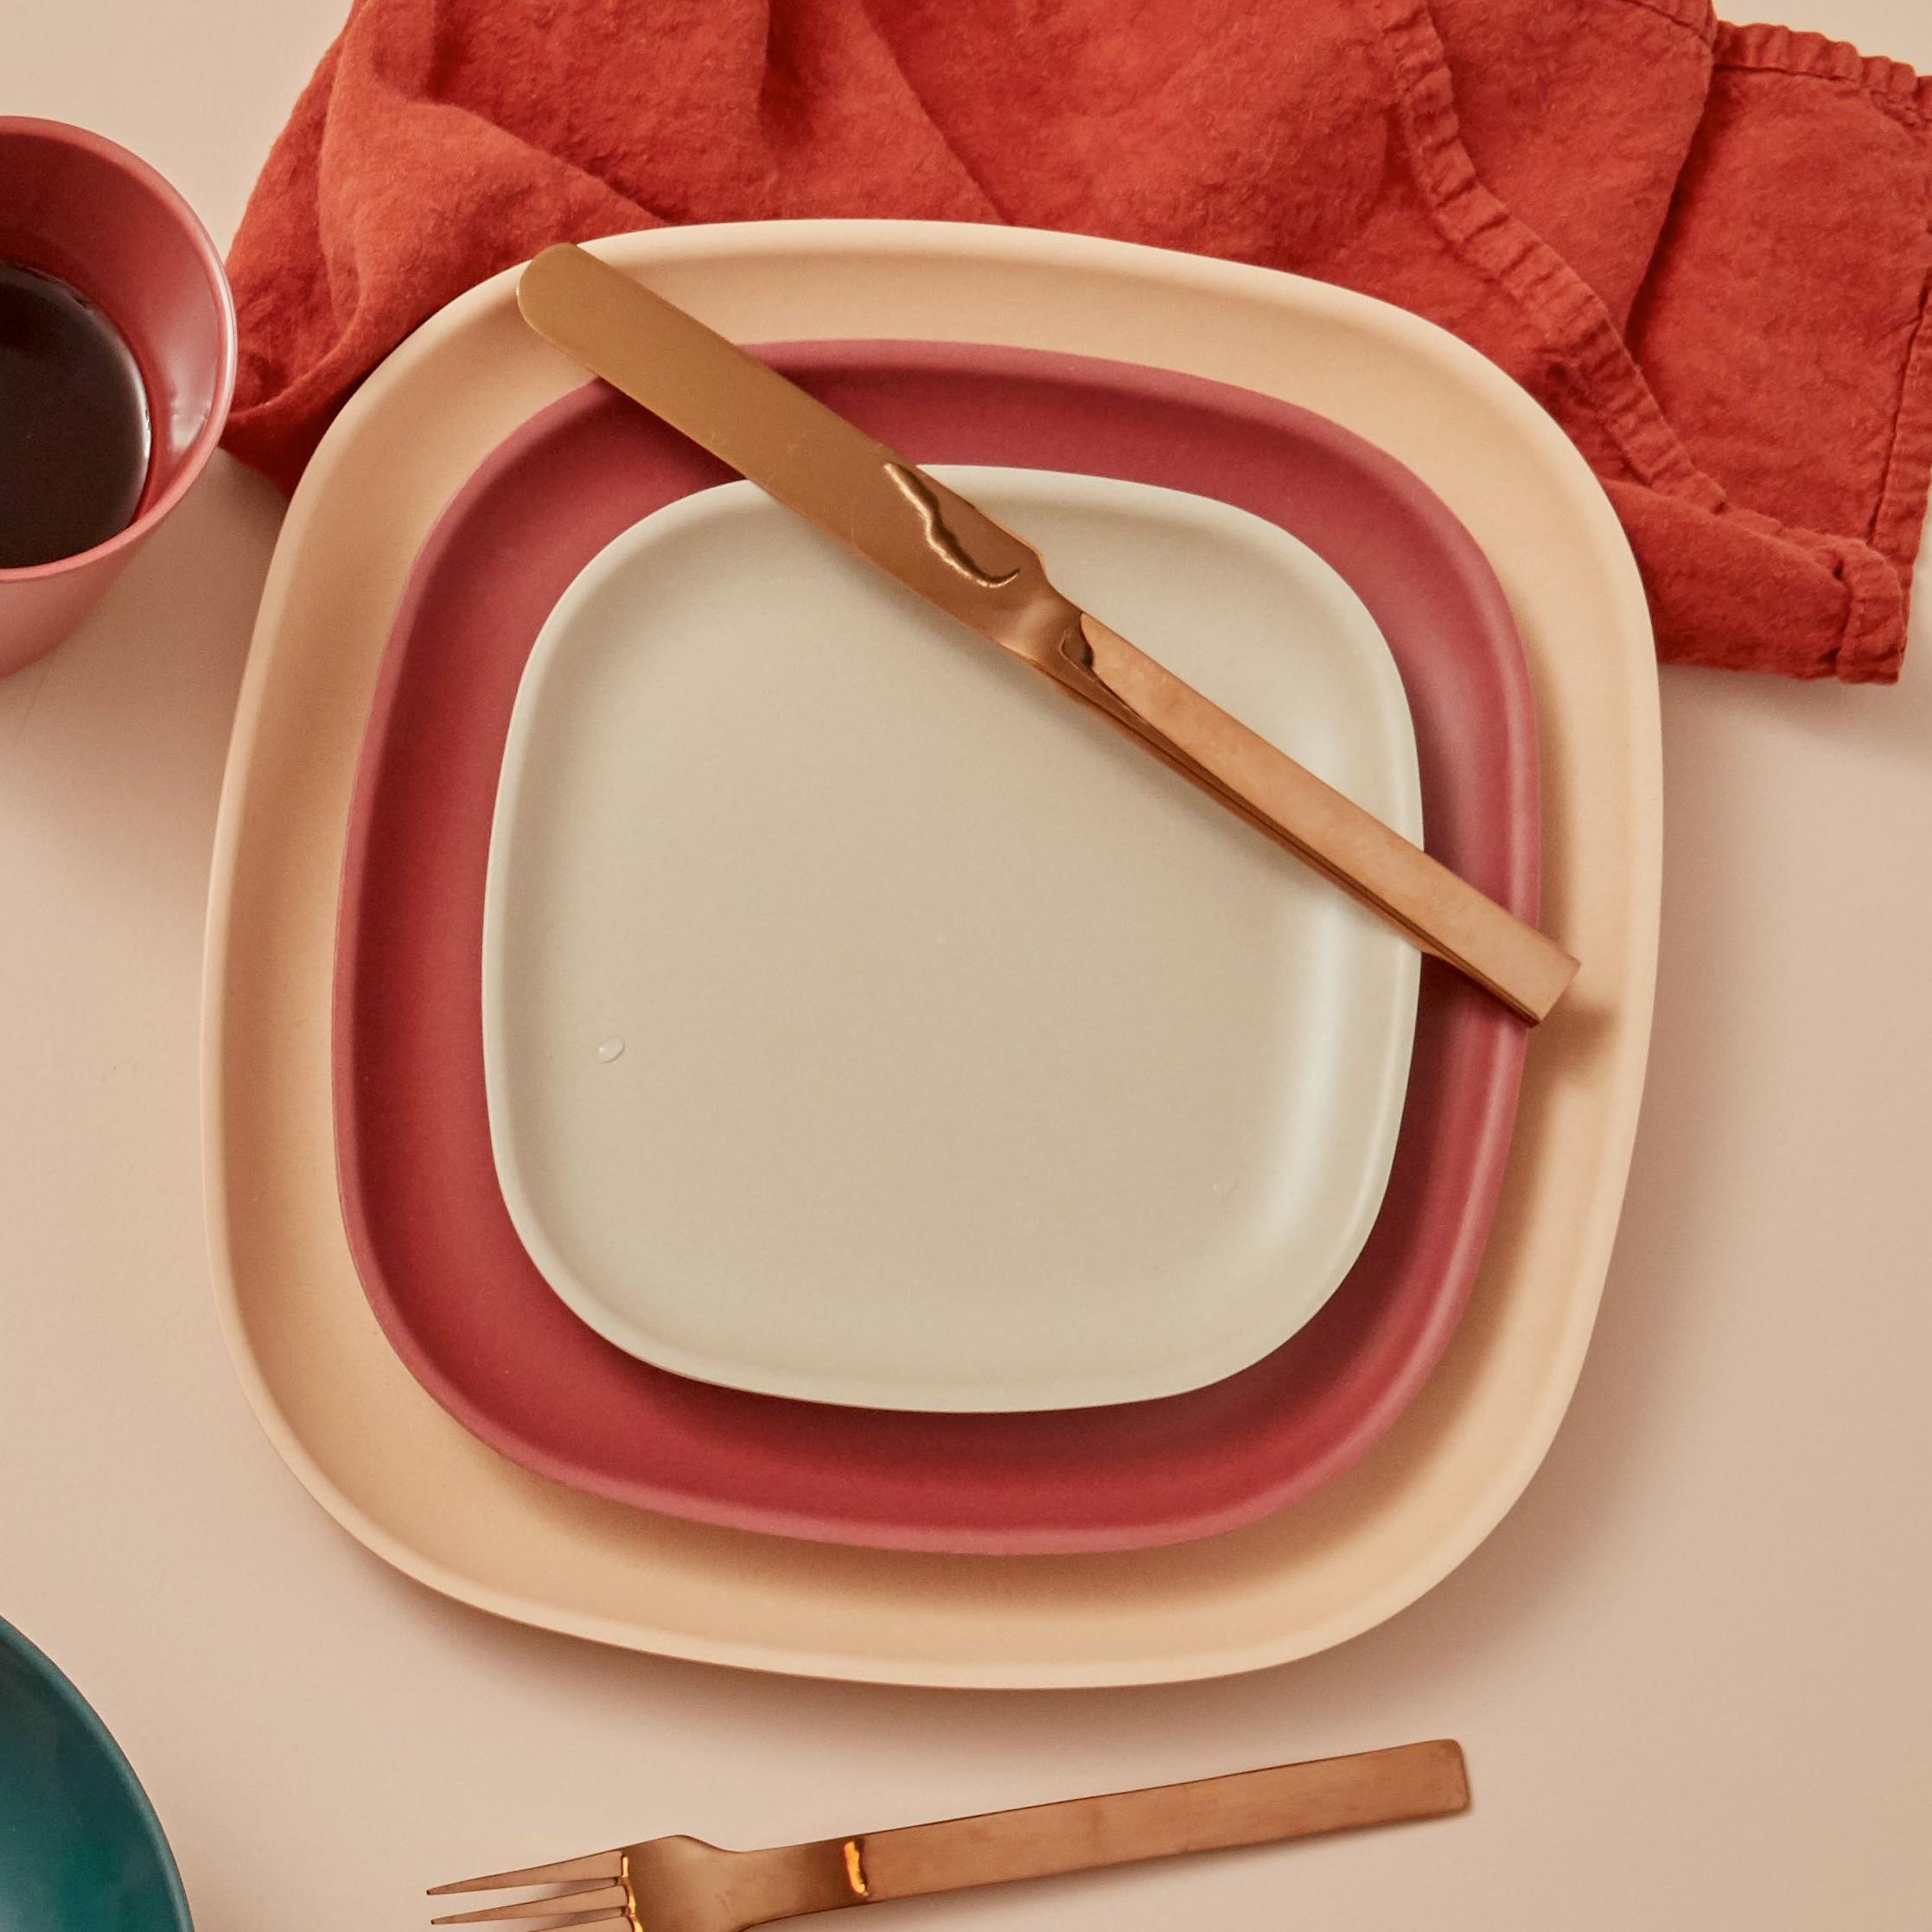 ekobo plates all 3 sizes staked